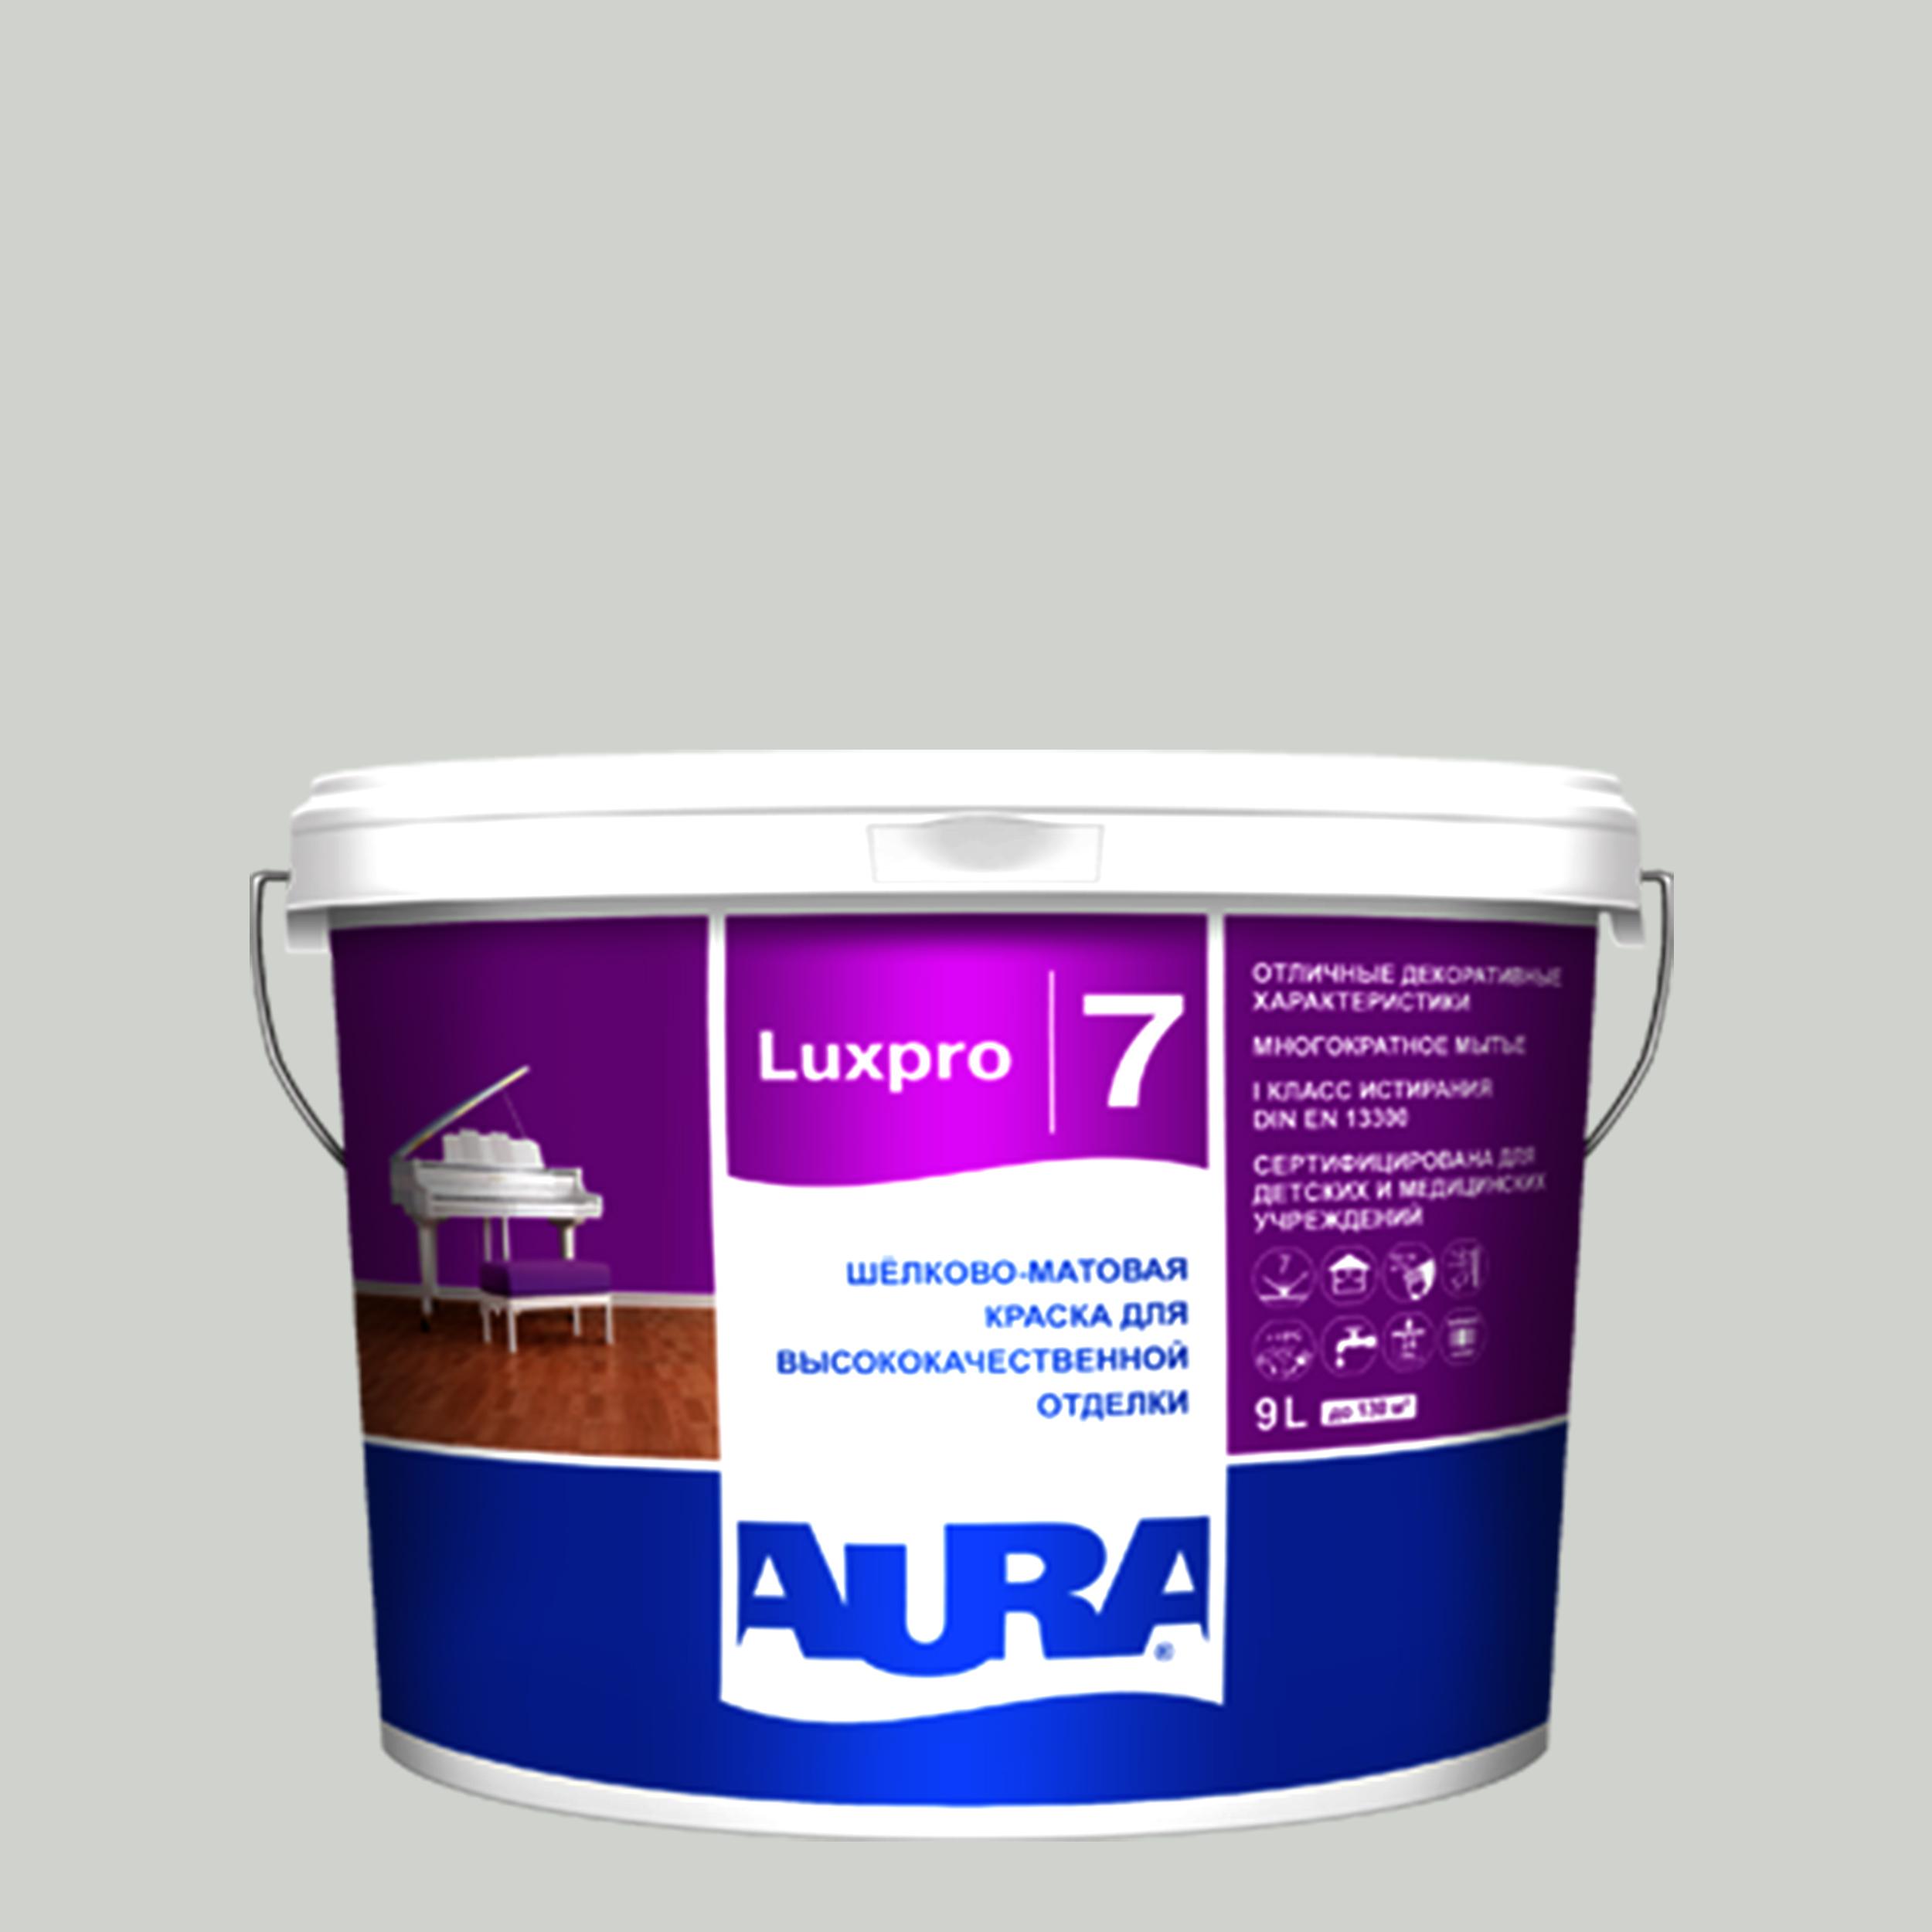 Фото 5 - Краска интерьерная, Aura LuxPRO 7, RAL 2001, 11 кг.